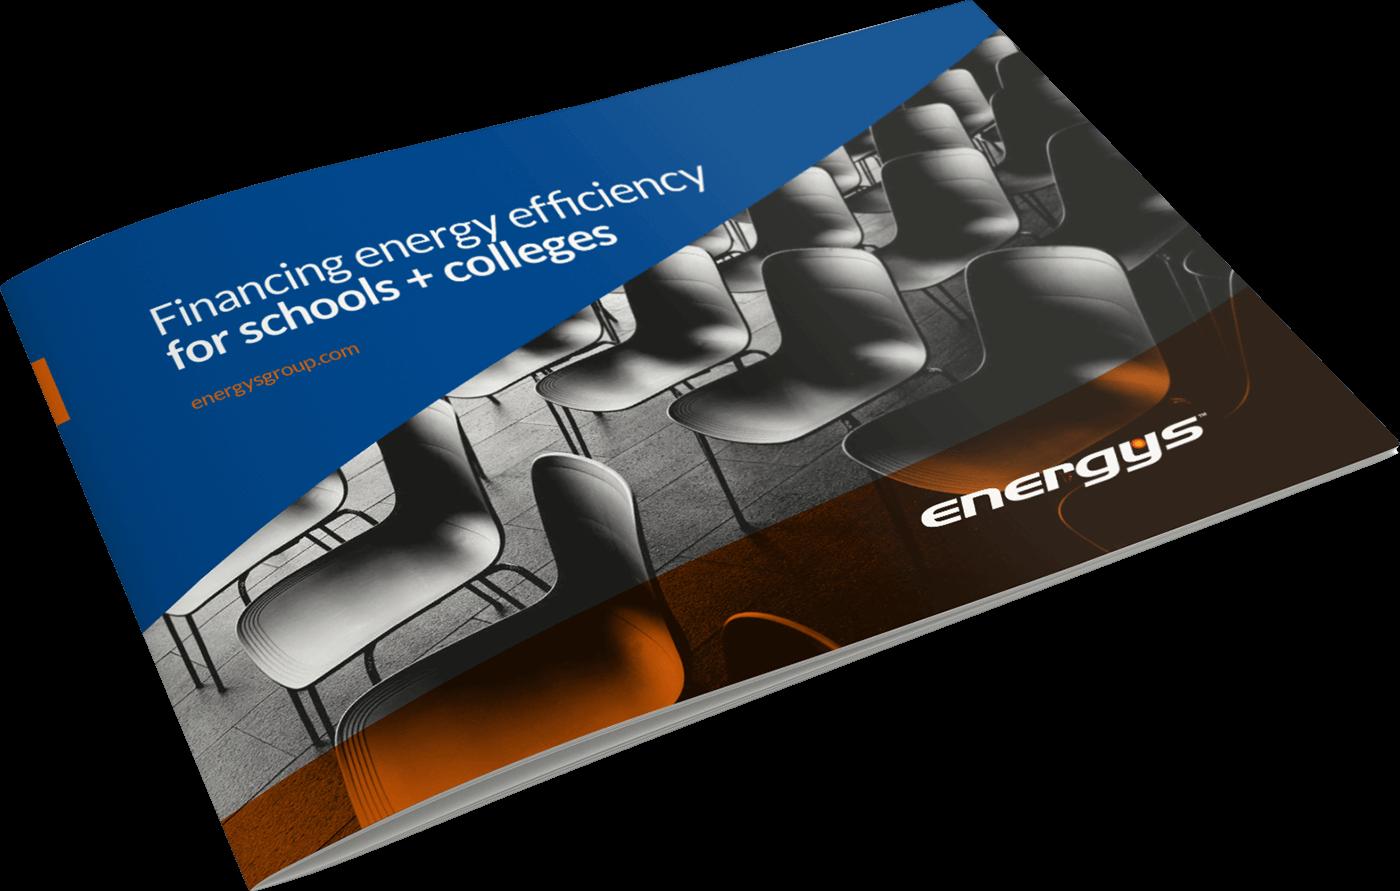 Energys Schools Energy Efficiency Finance Brochure Mockup